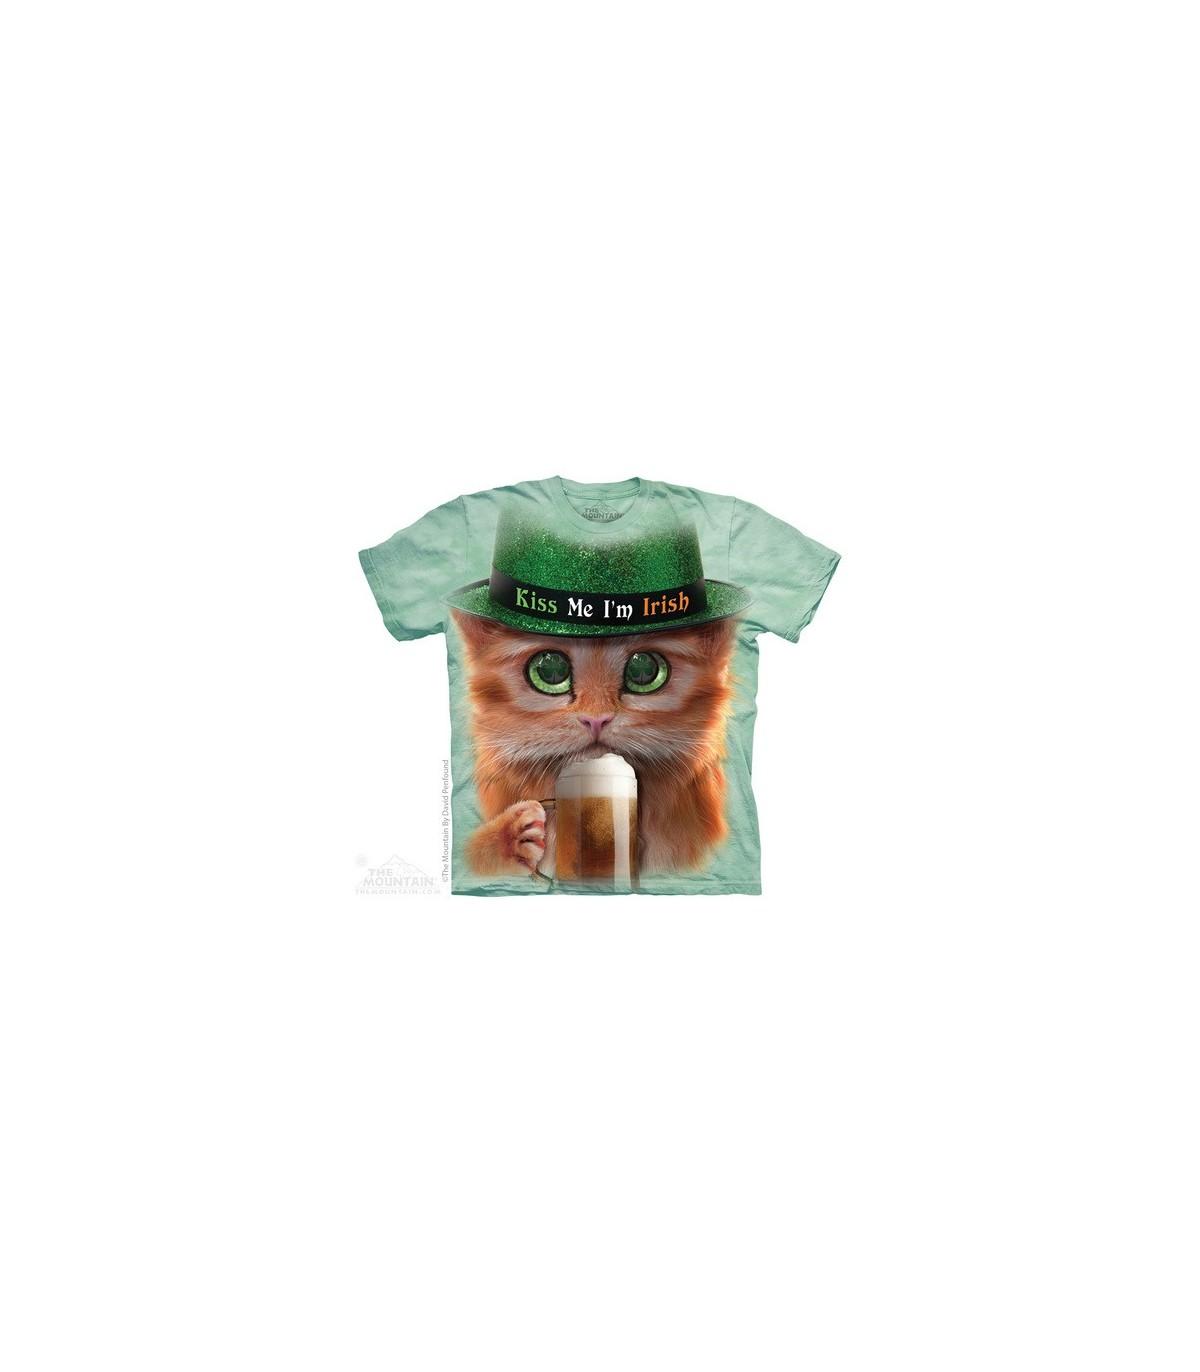 f2b4a627 big-face-irish-kitty-cat-t-shirt-the-mountain.jpg